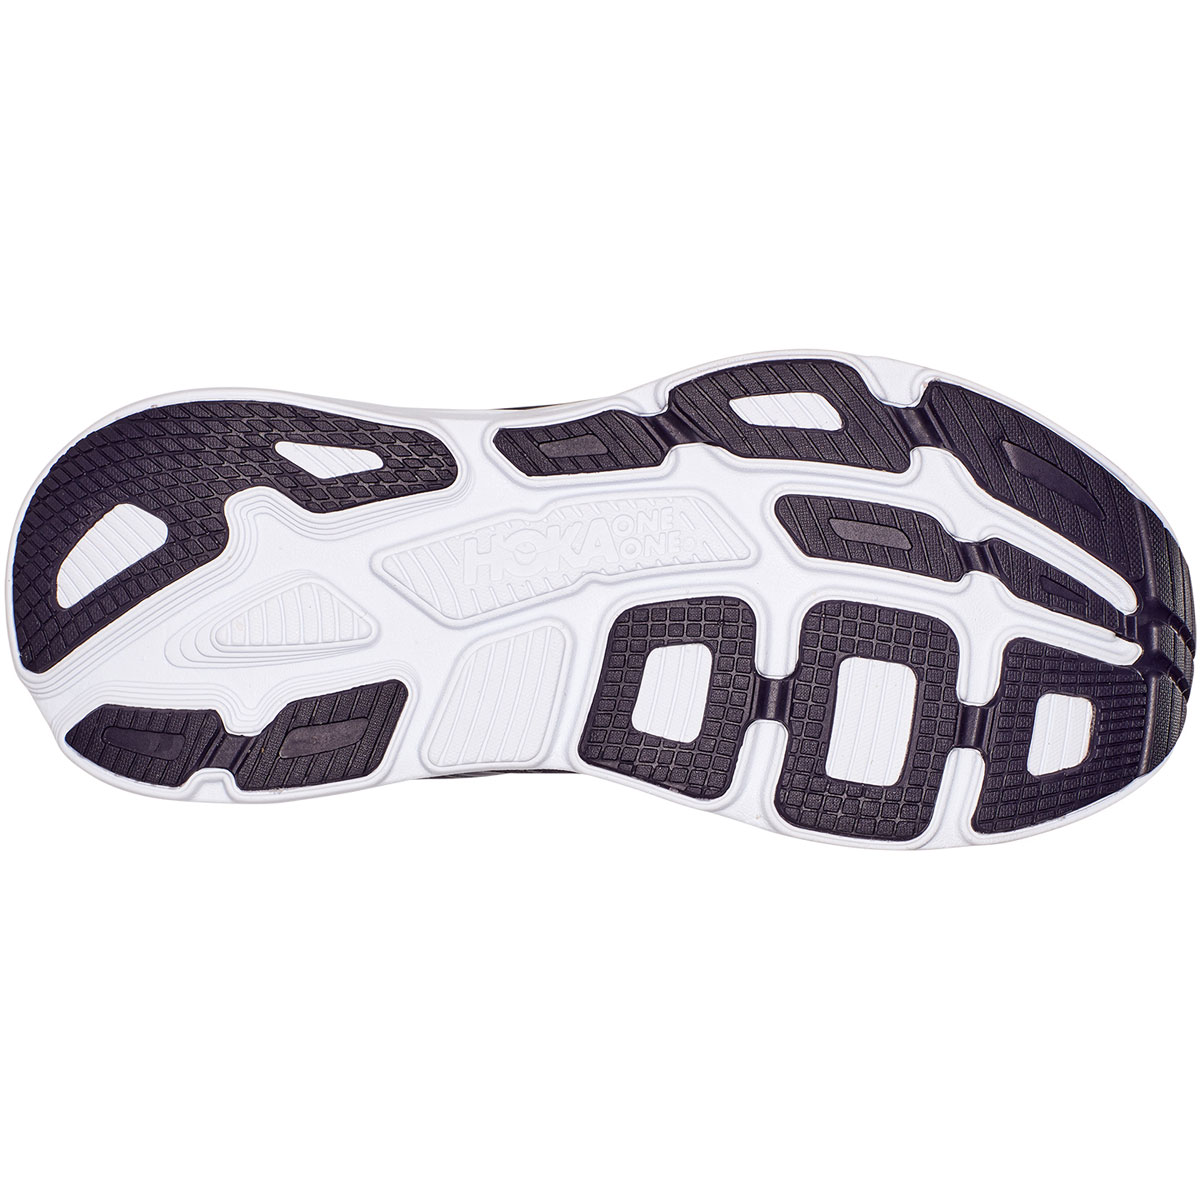 Men's Hoka One One Bondi 7 Running Shoe - Color: Odyssey Grey/Deep Well - Size: 7 - Width: Regular, Odyssey Grey/Deep Well, large, image 3